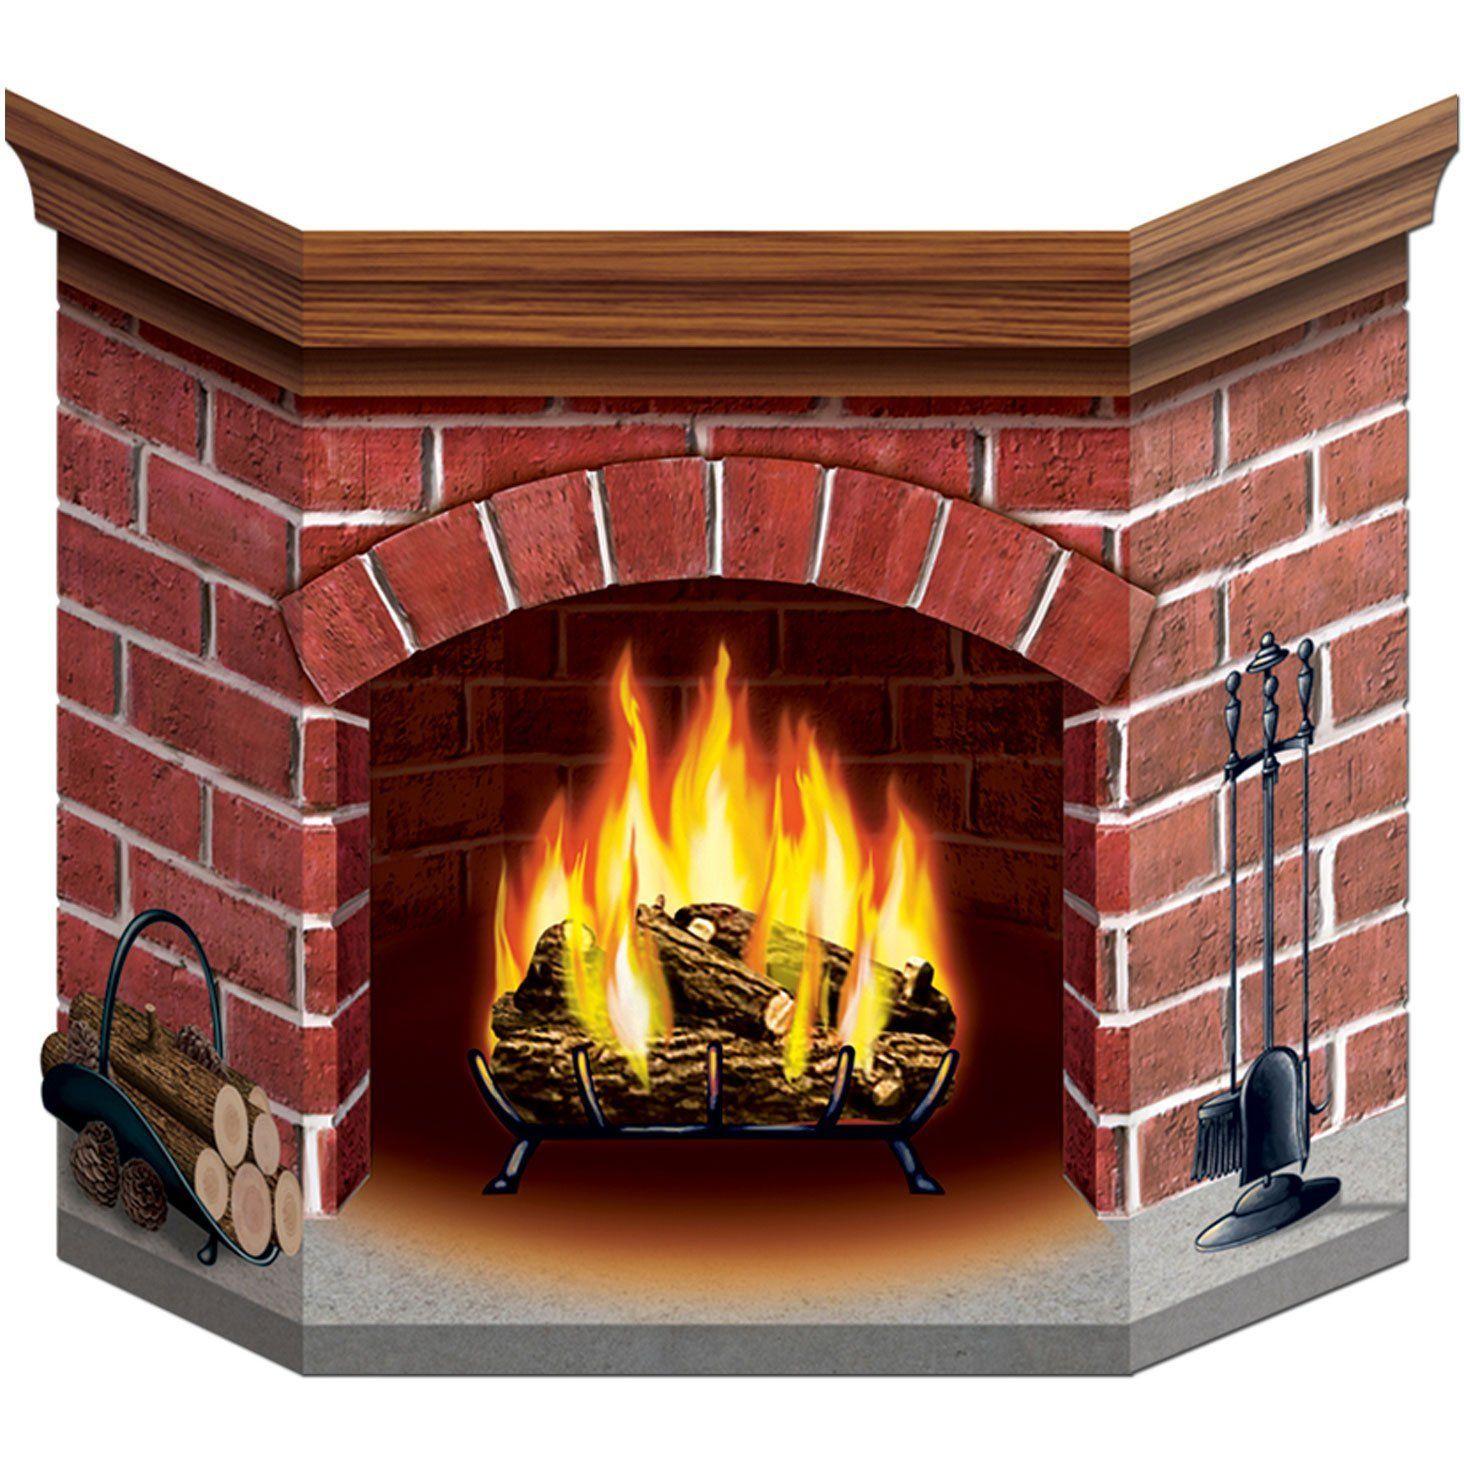 Box and Cardboard fireplace